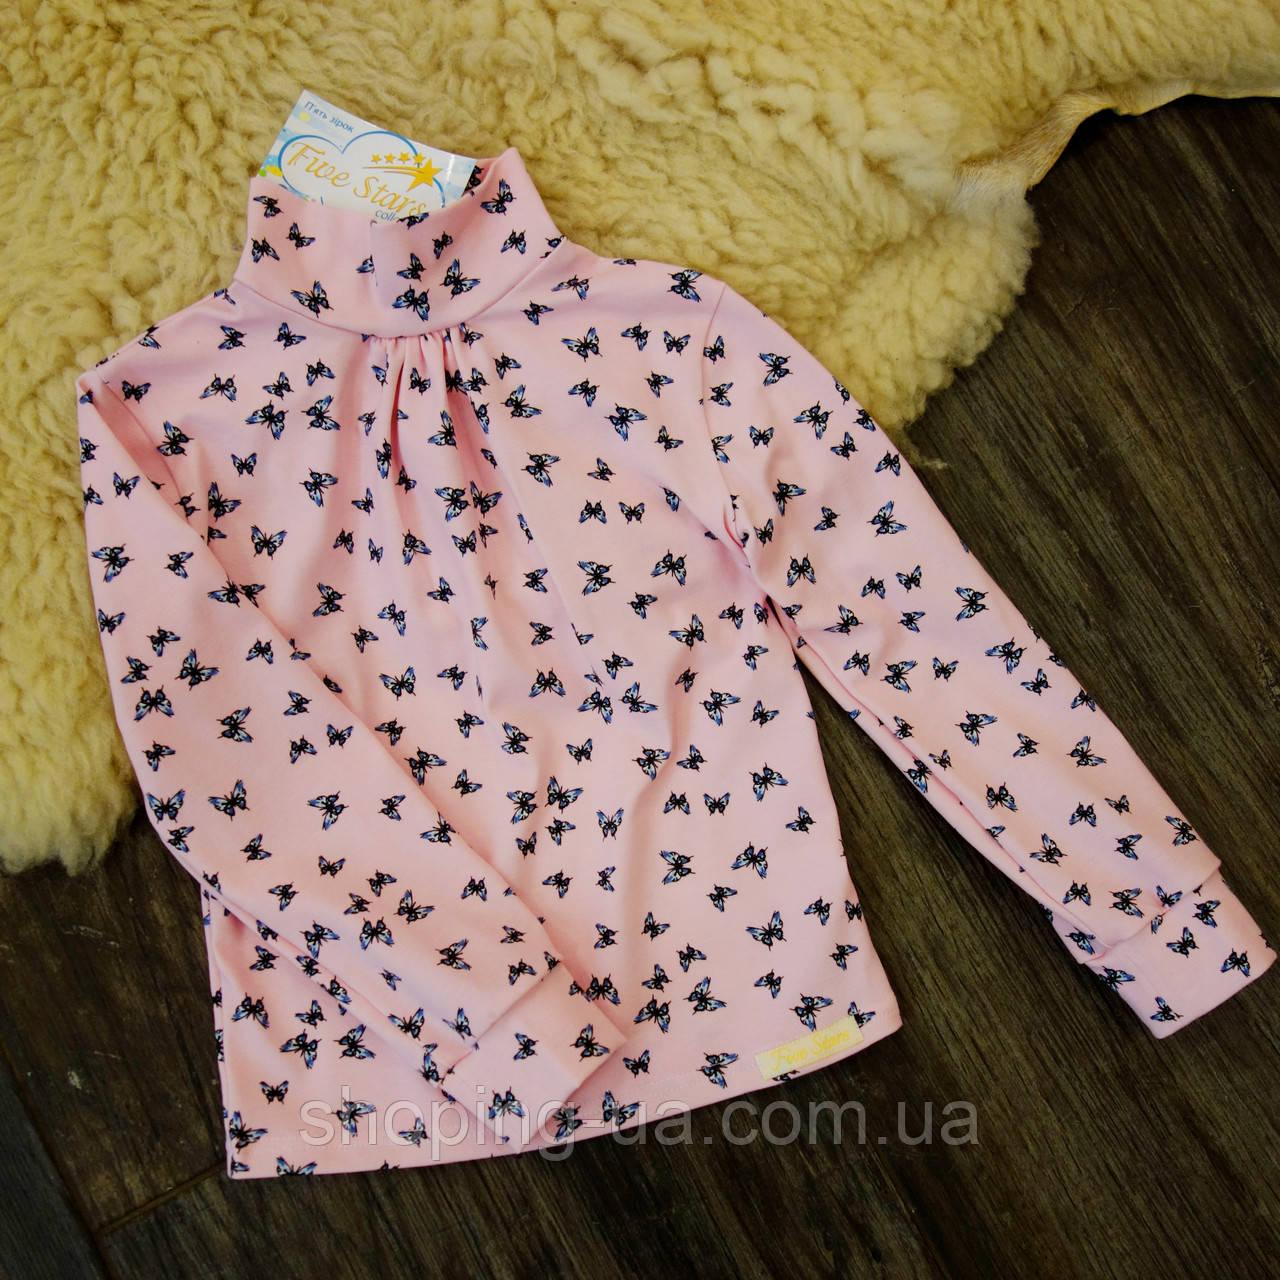 Стильная водолазка - гольф бабочки на розовом Five Stars KD0398-116р